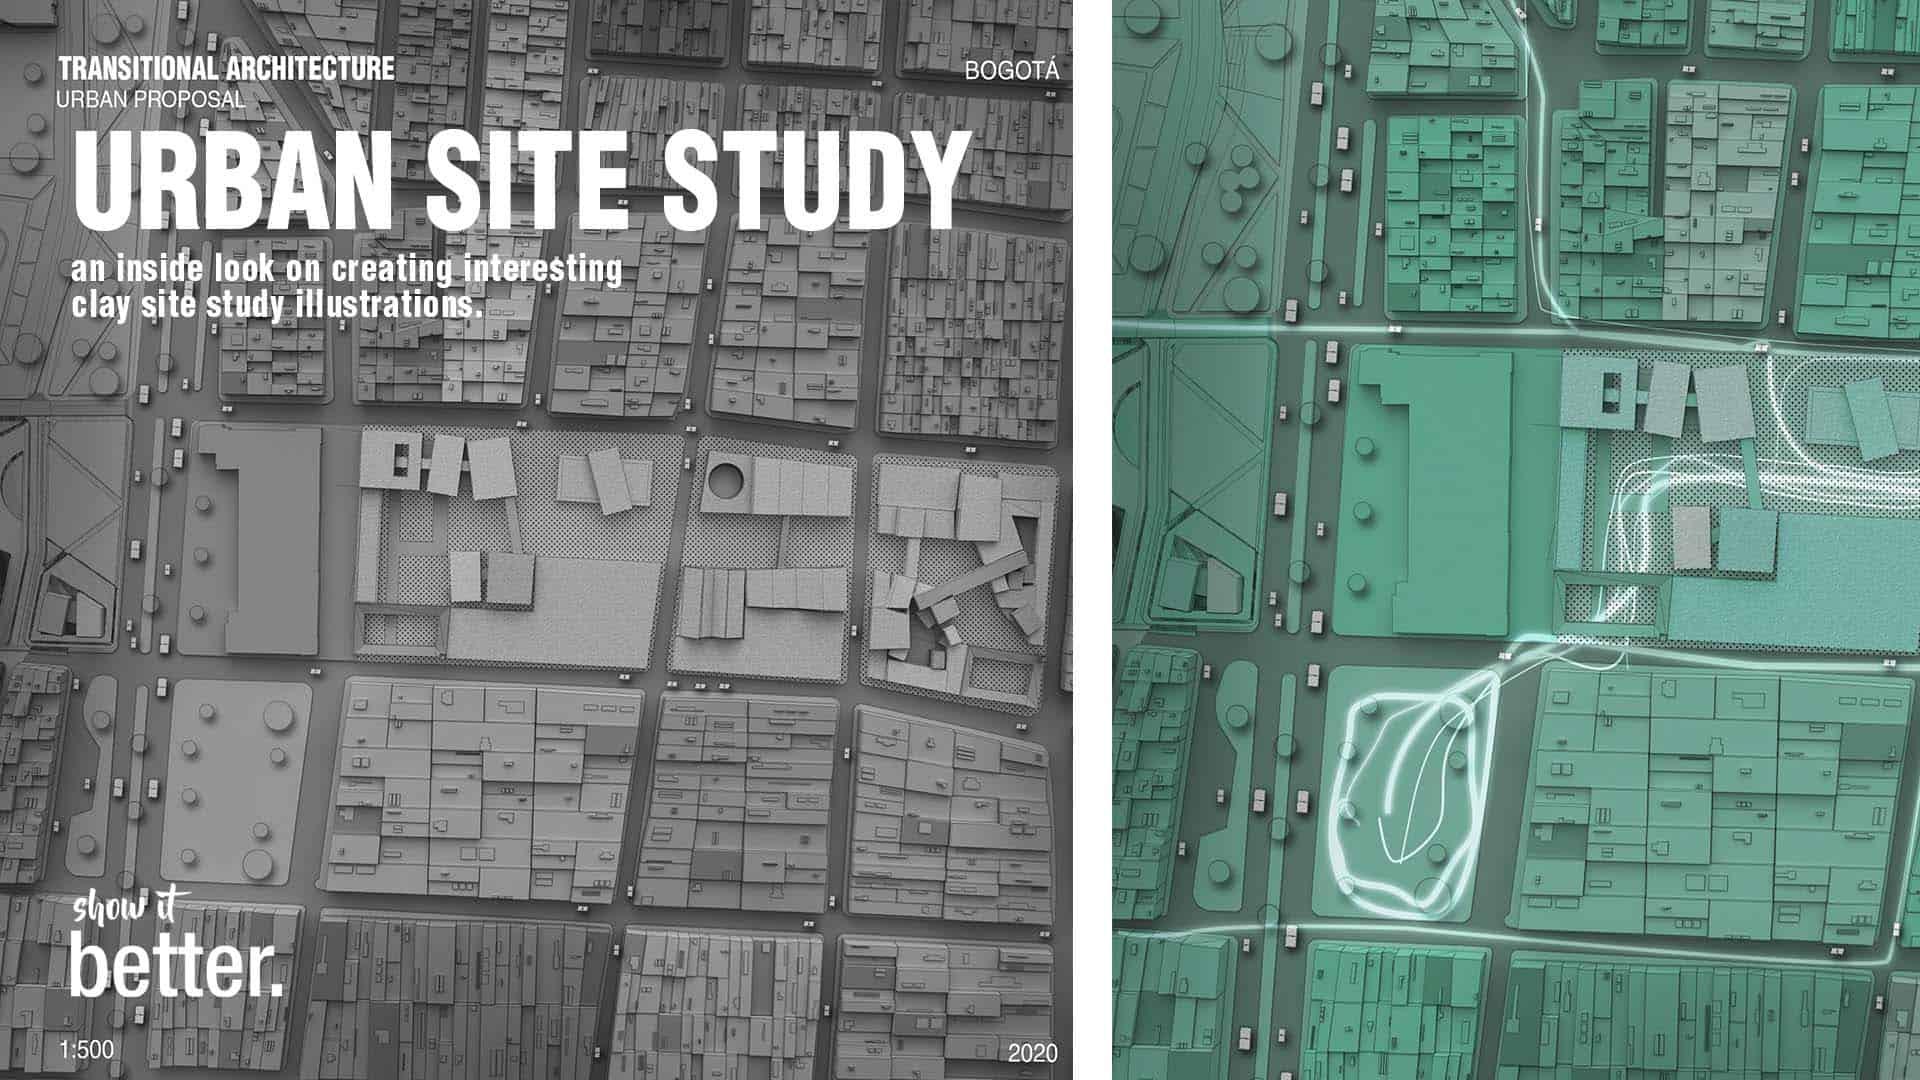 Urban Site Study